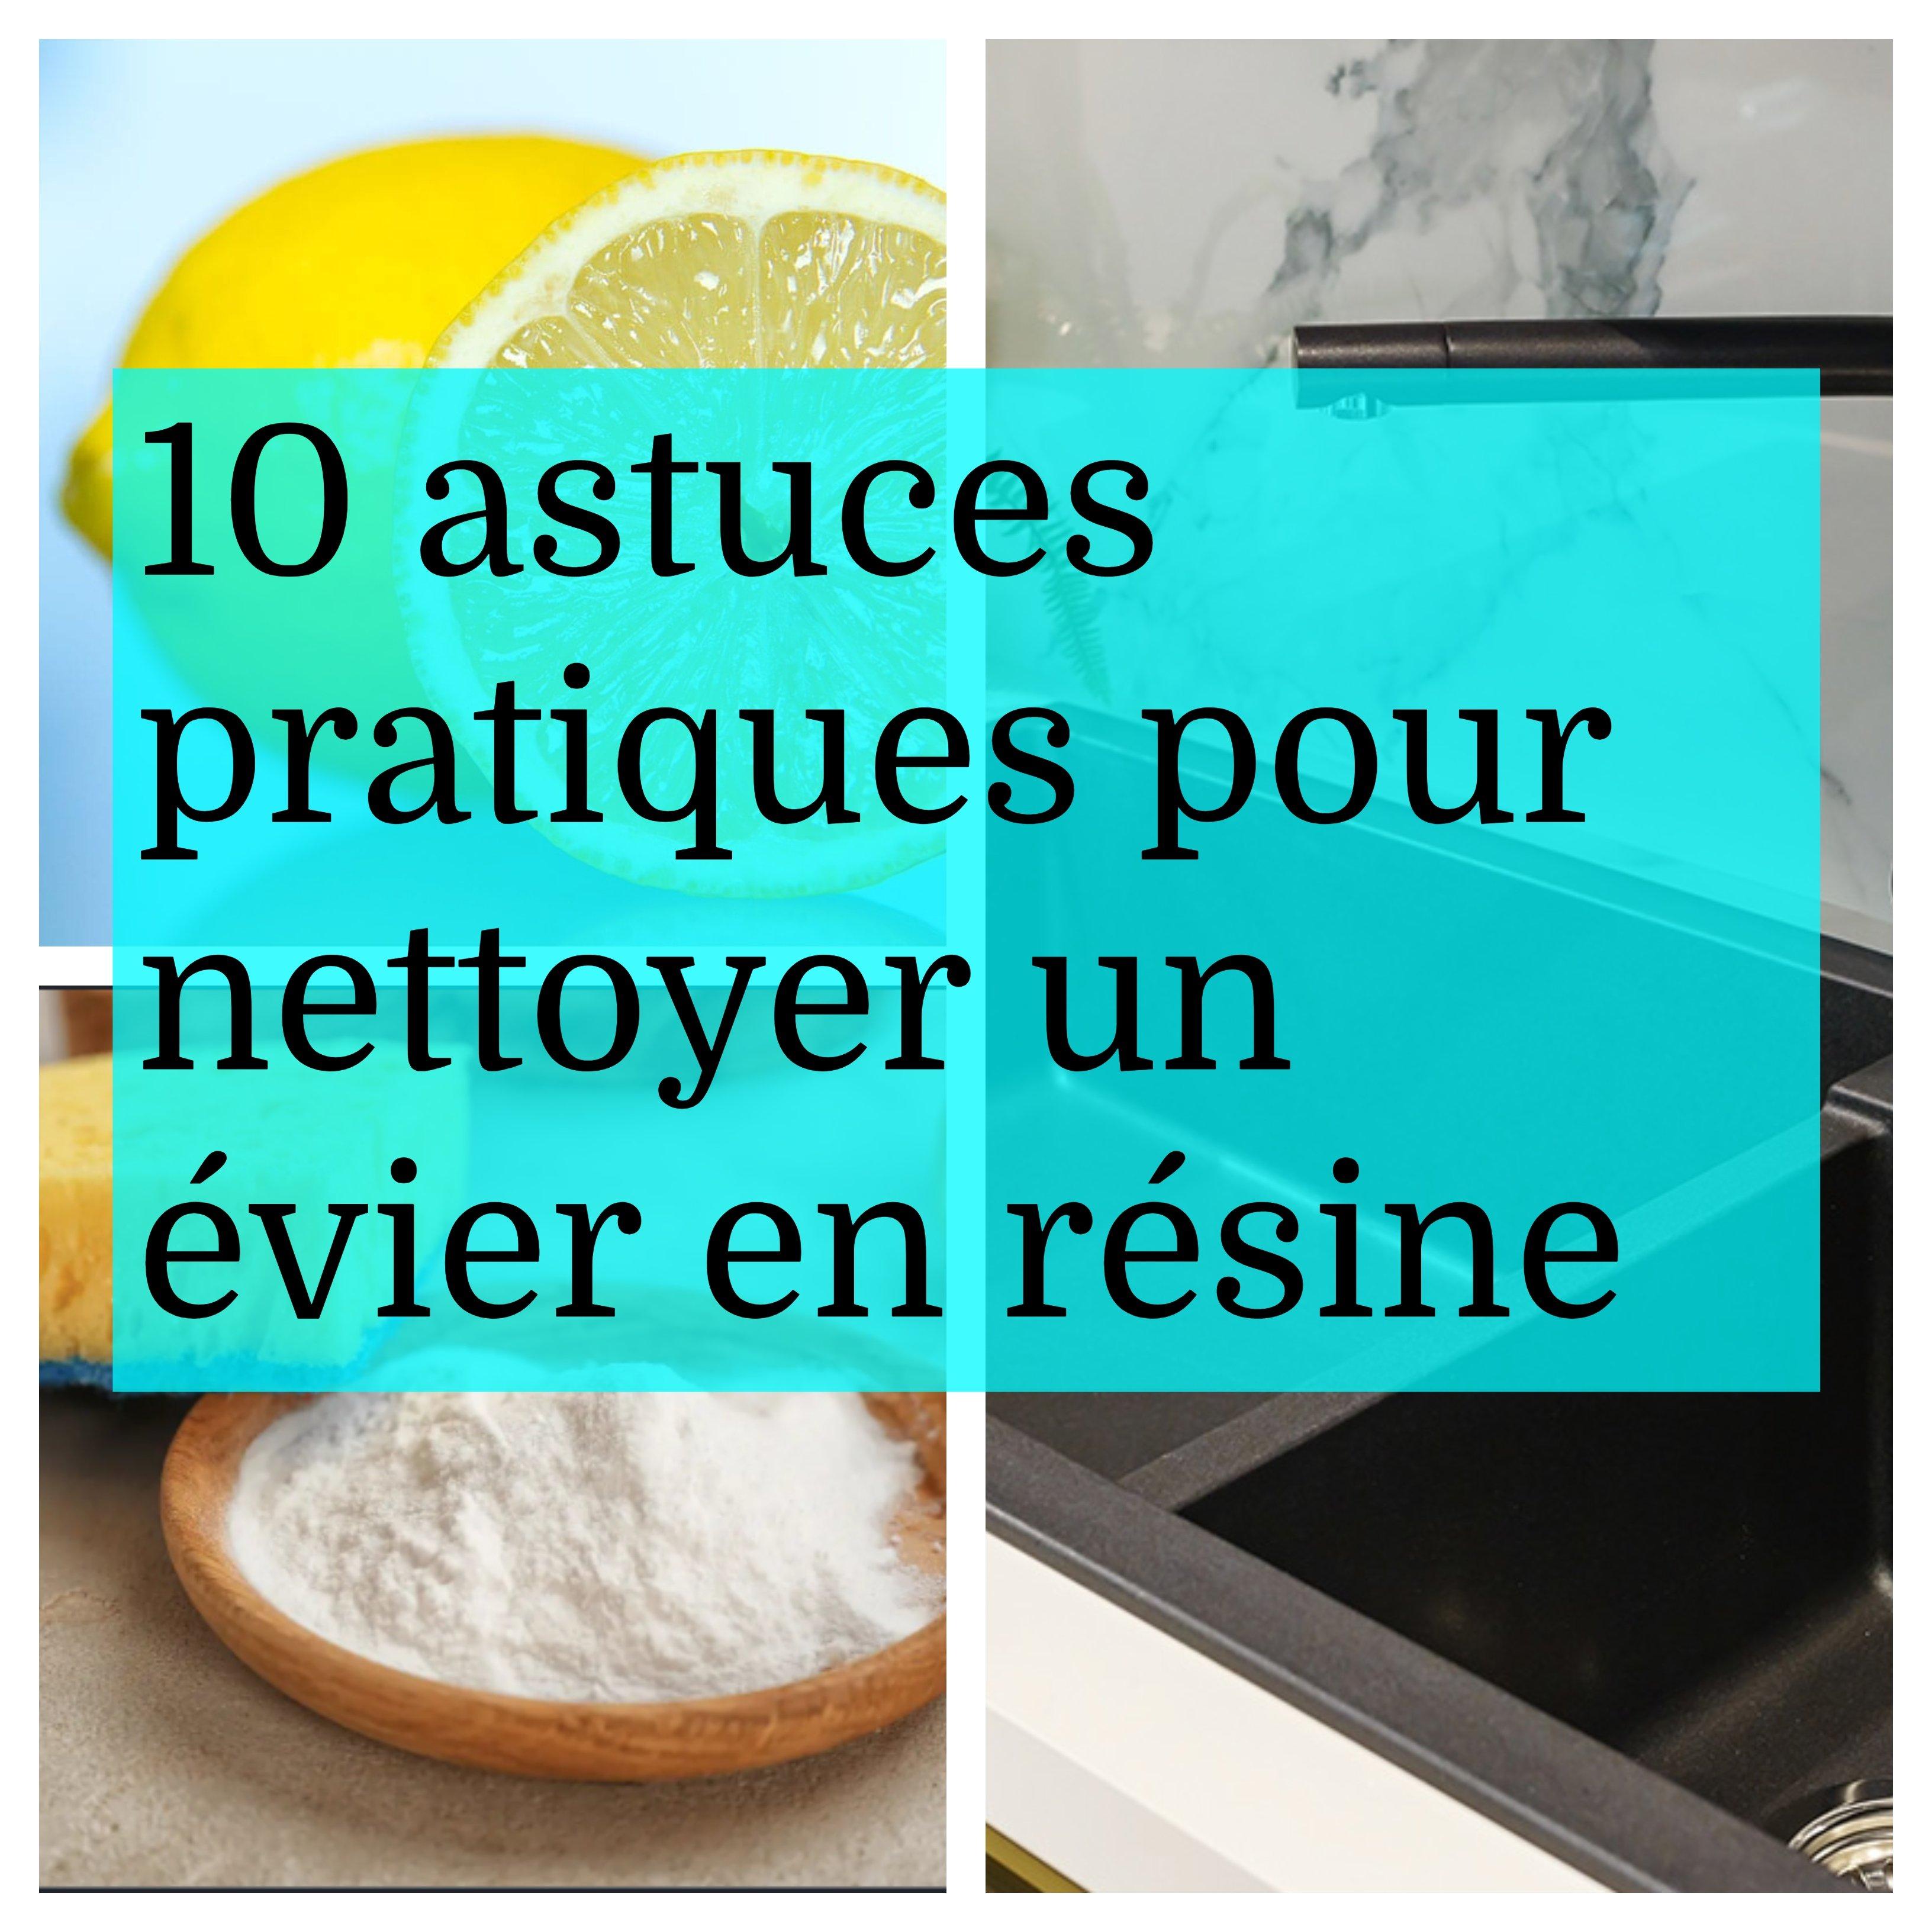 100 Génial Suggestions Nettoyer Evier Resine Tache